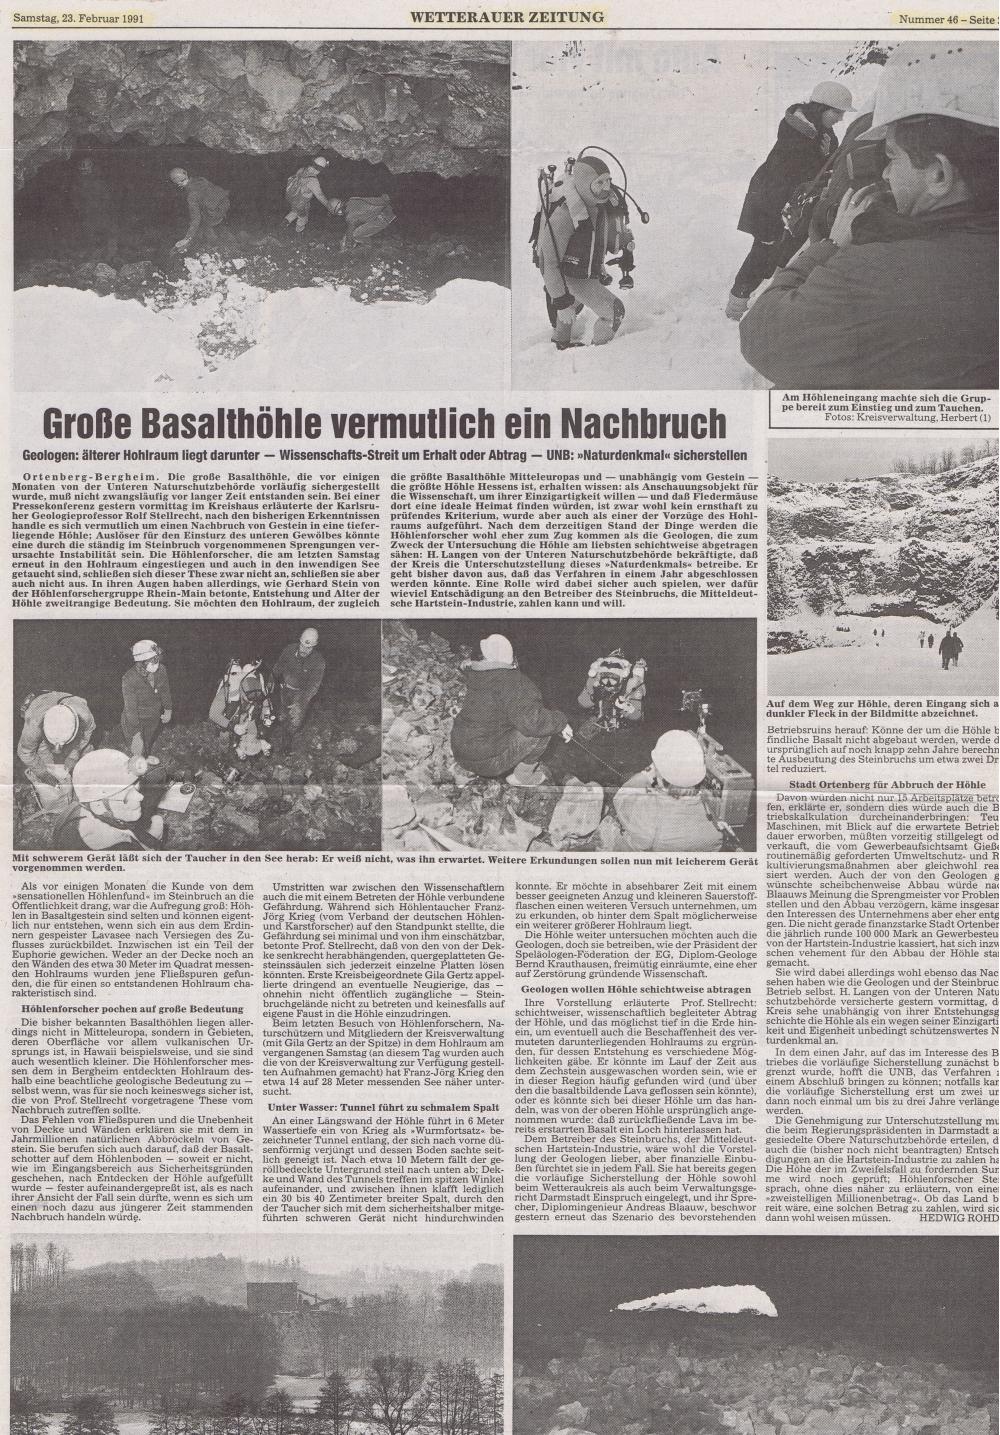 19910220_print_FR_Basalthoehle_1000